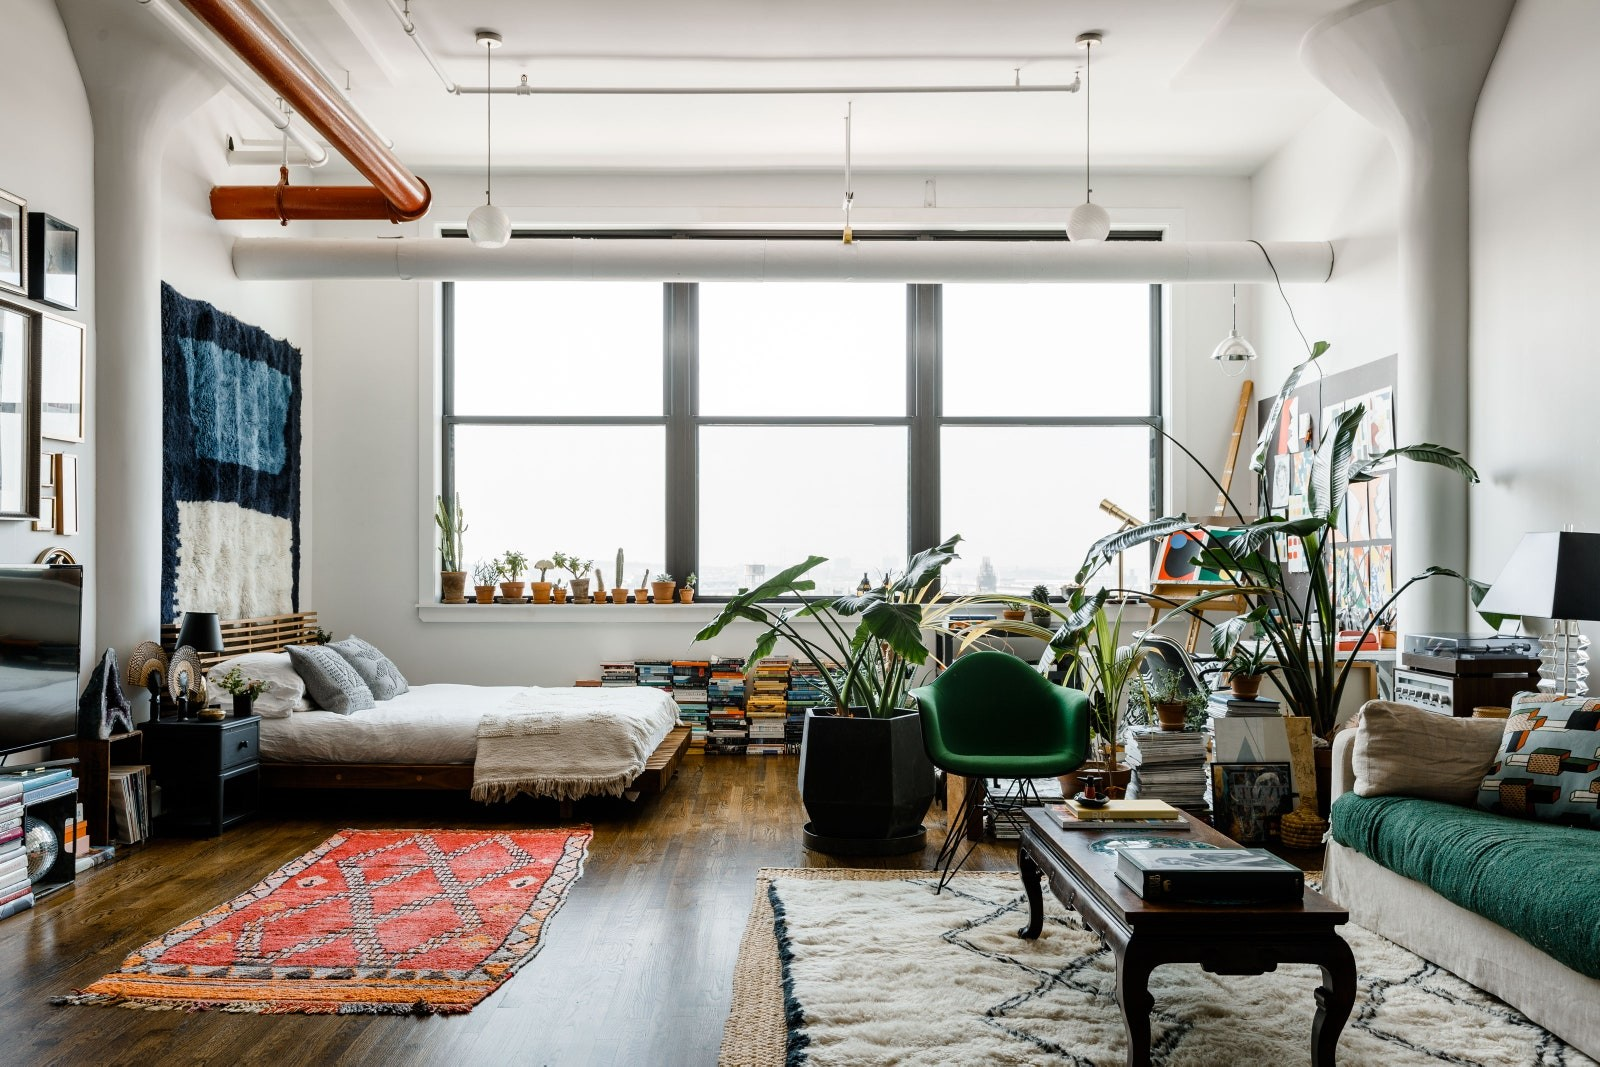 beni-rugs-apartment-brooklyn-01.jpg